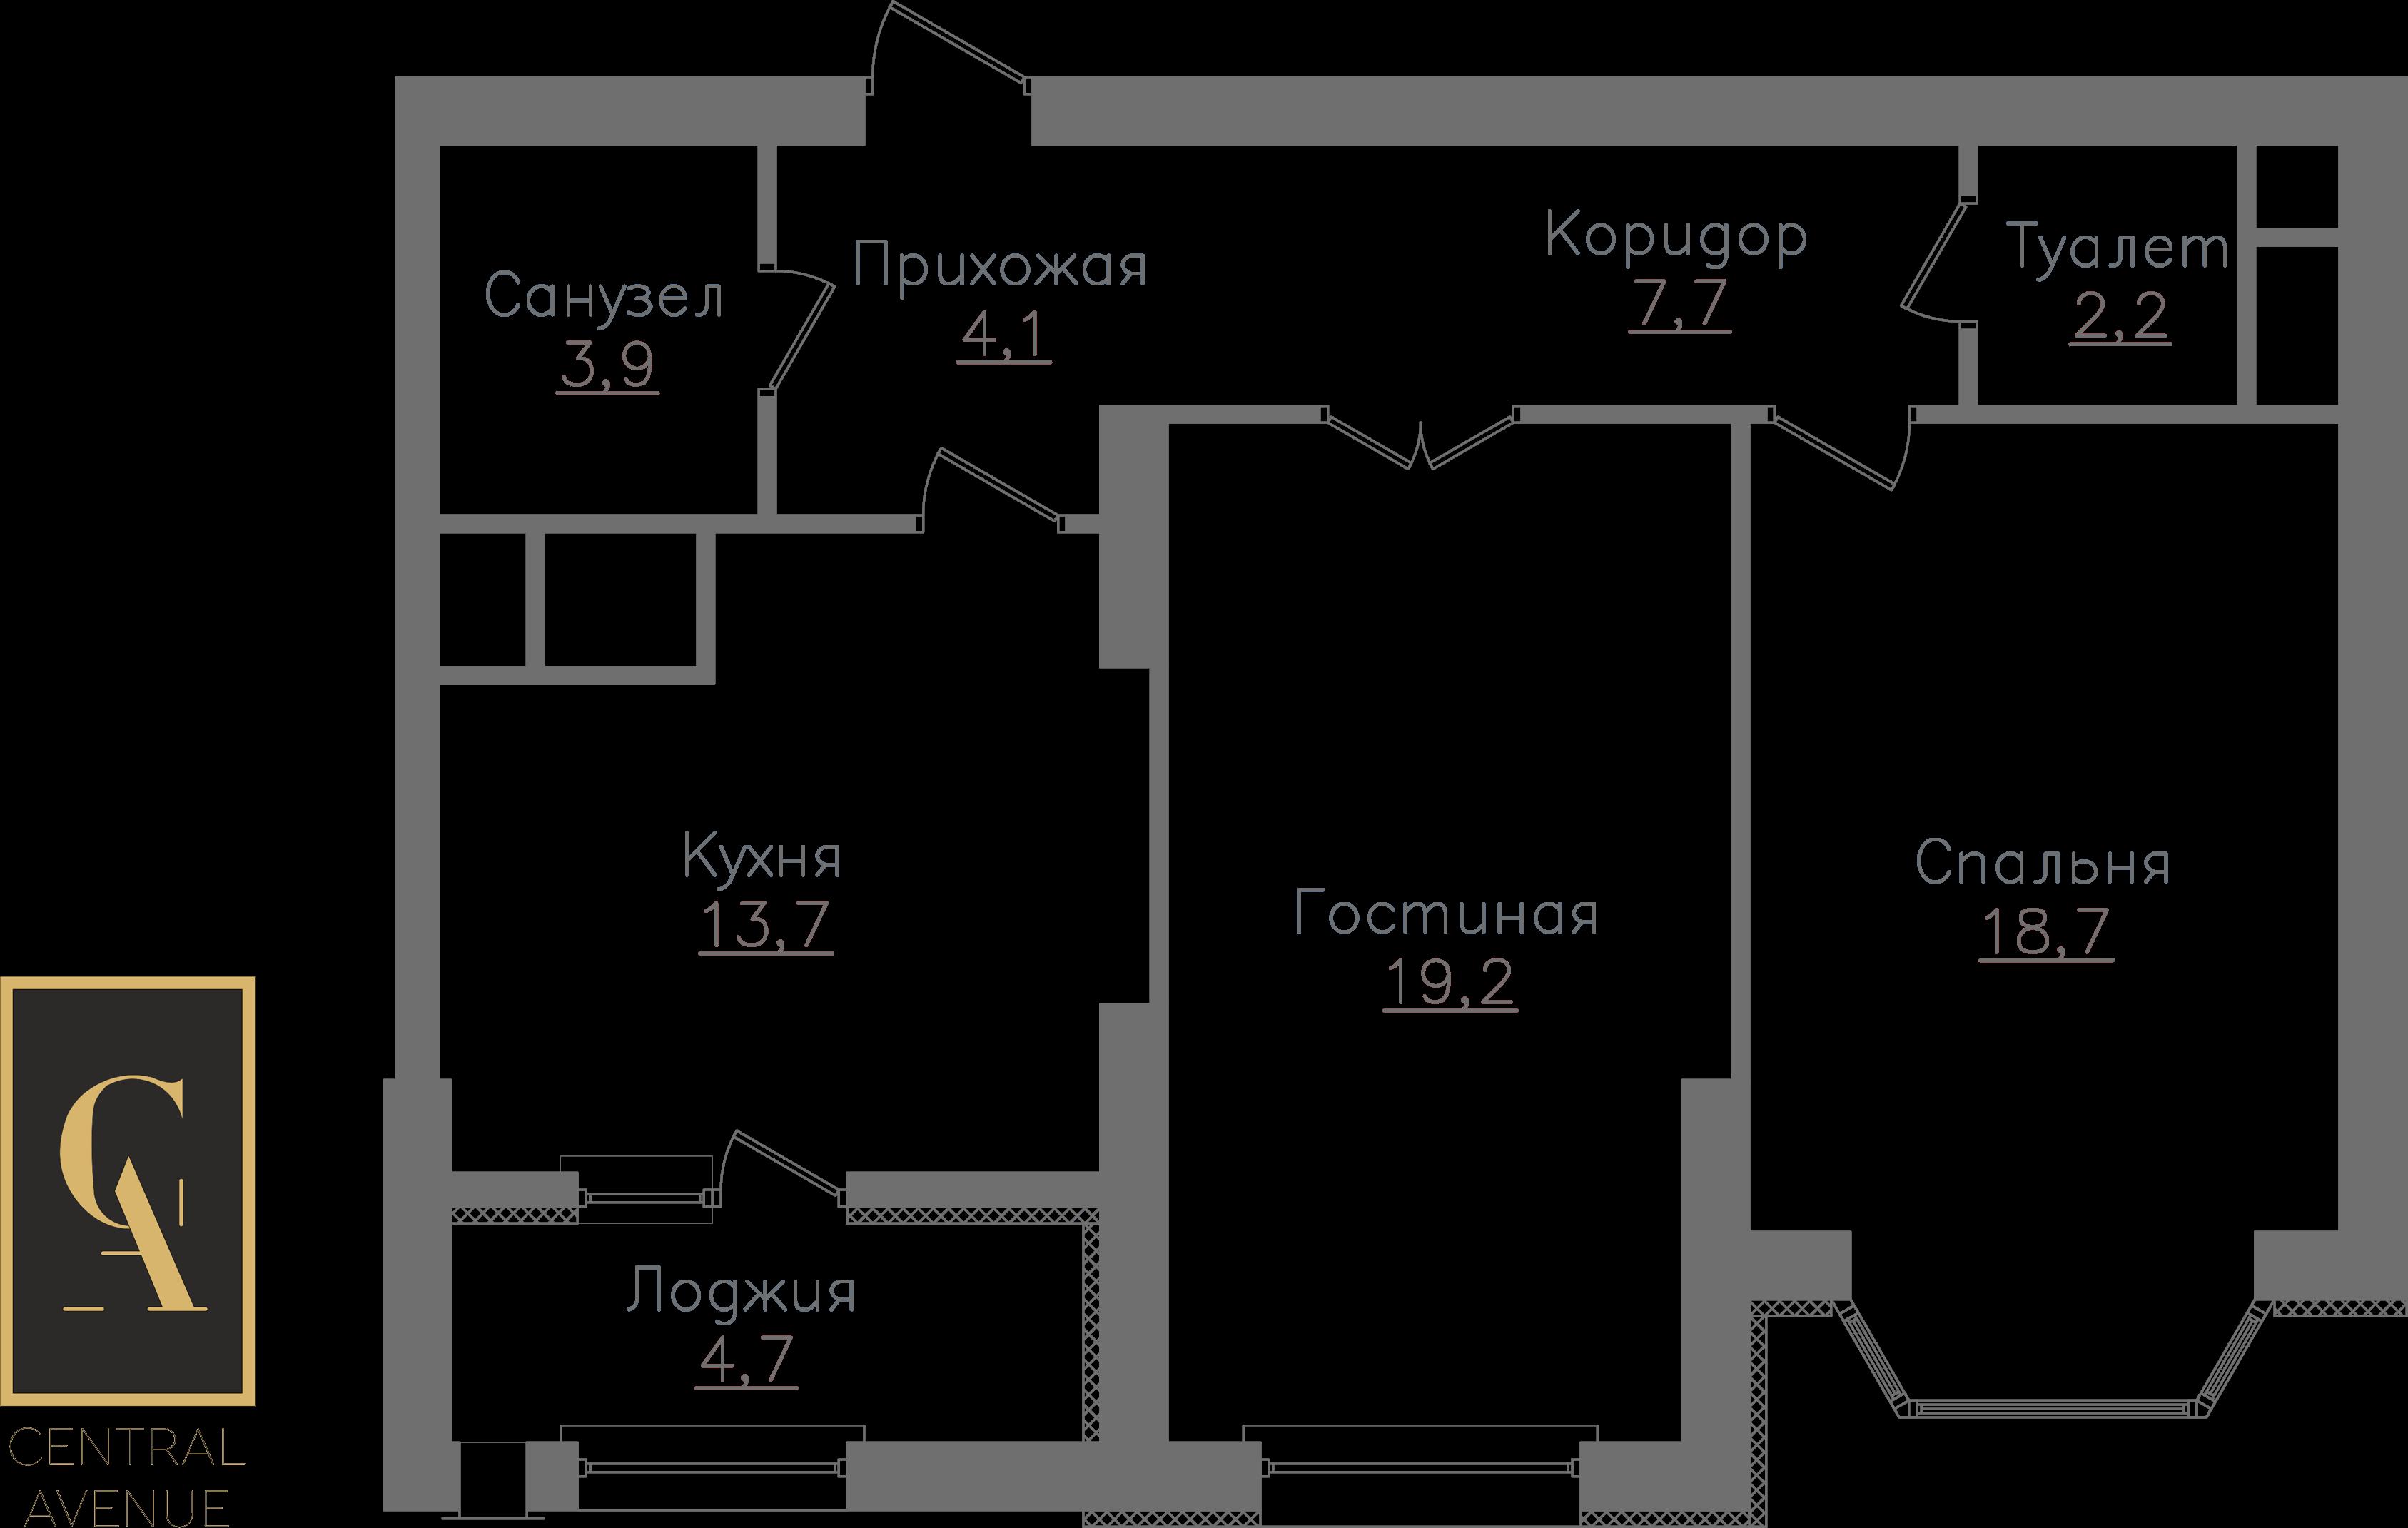 Пәтер 152